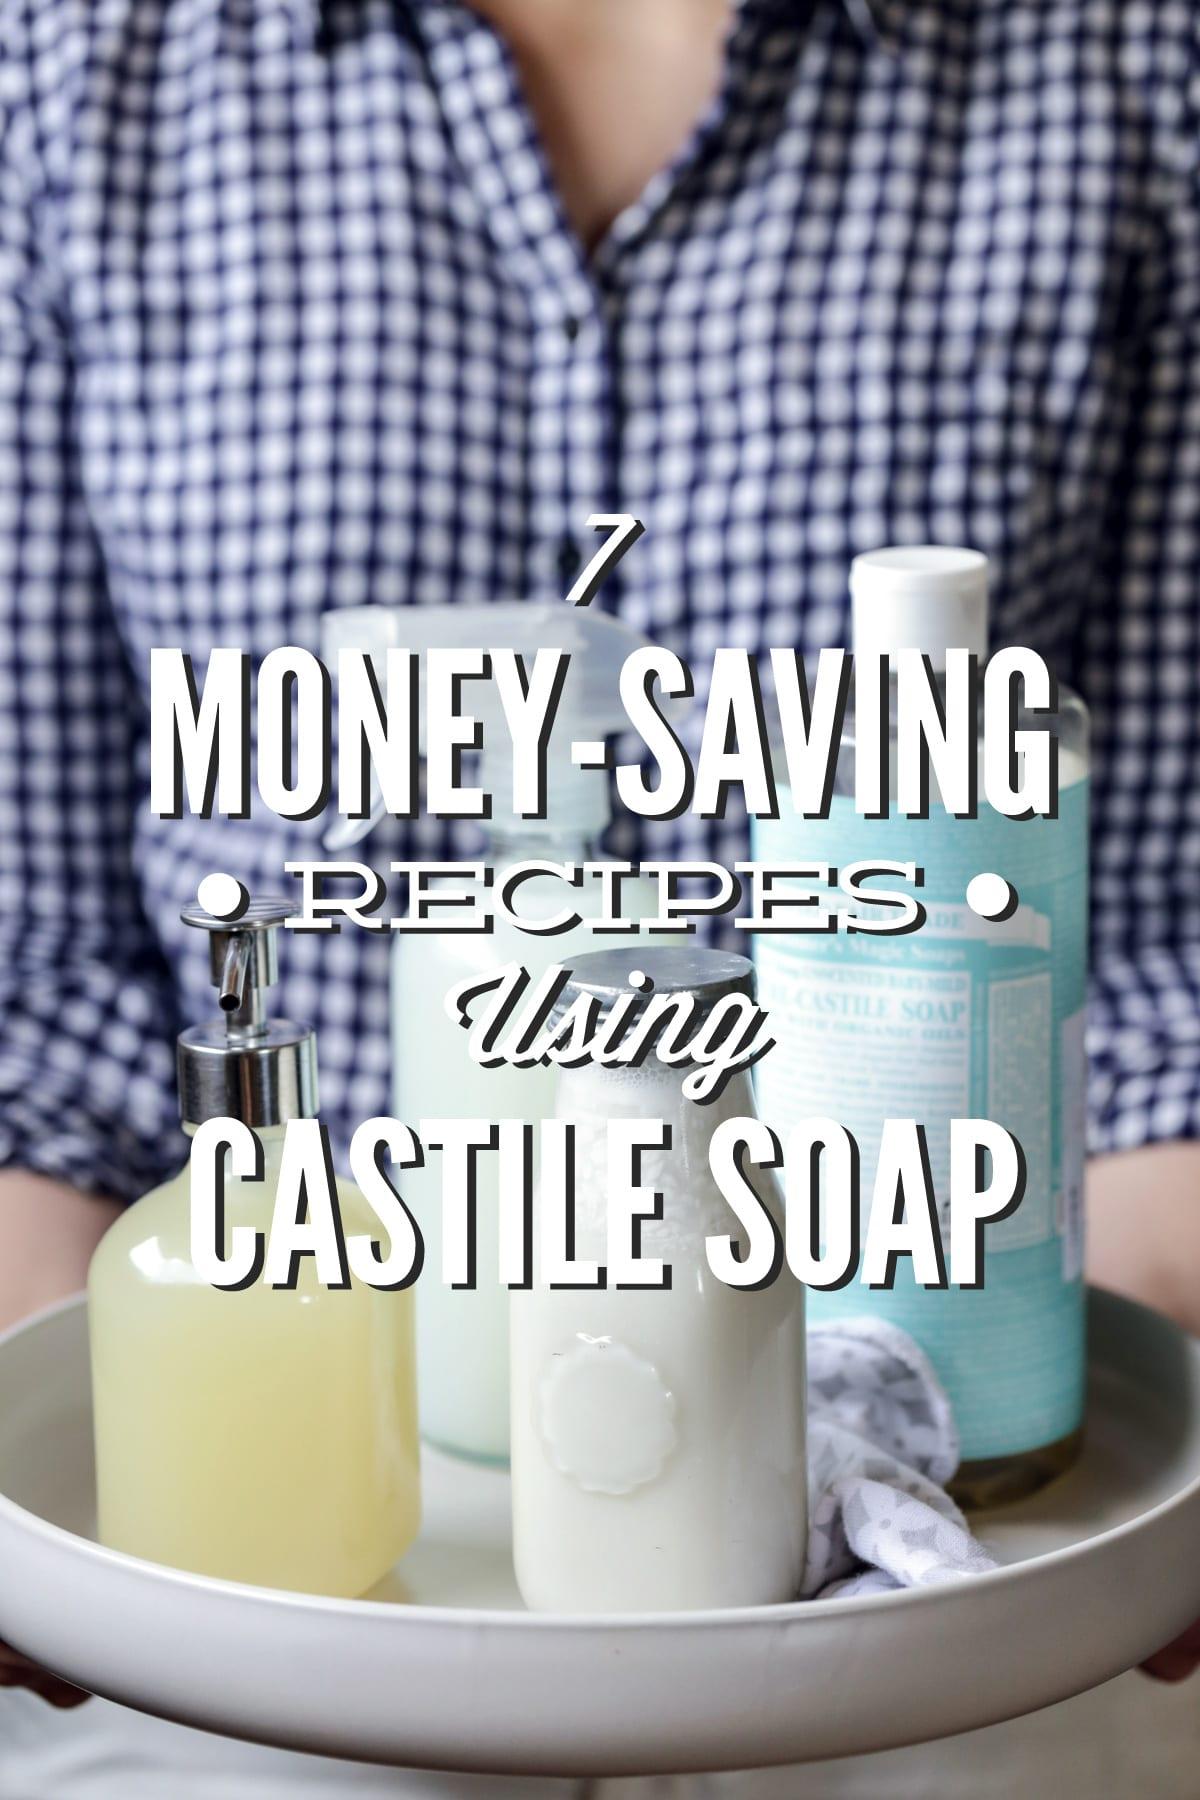 7 Money Saving Recipes Using Castile Soap Live Simply